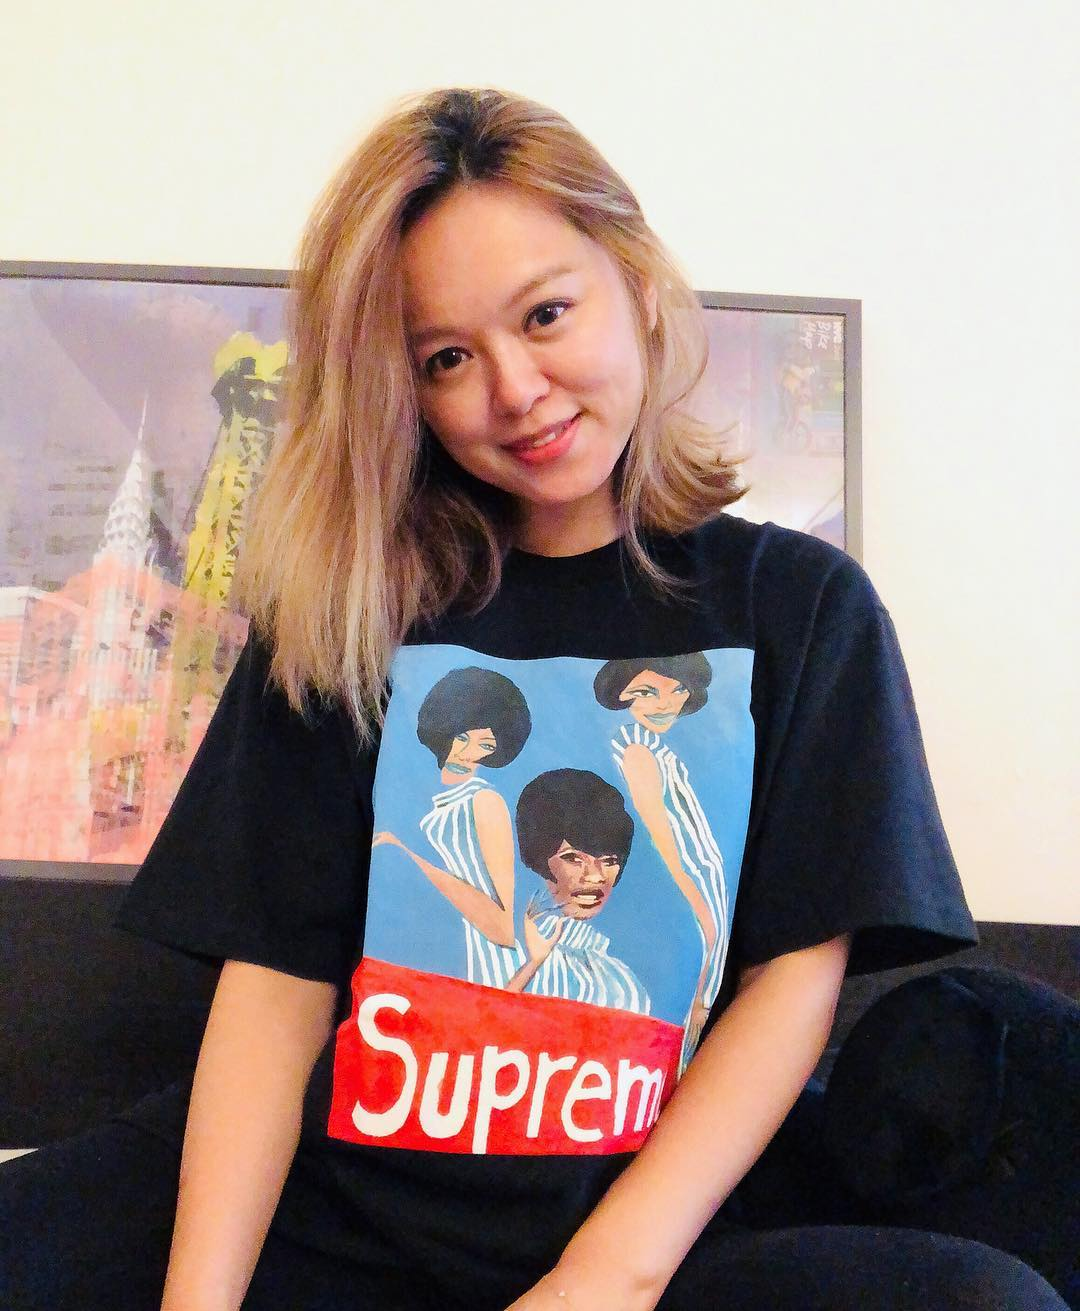 supreme-online-store-20180922-week5-release-items-snap